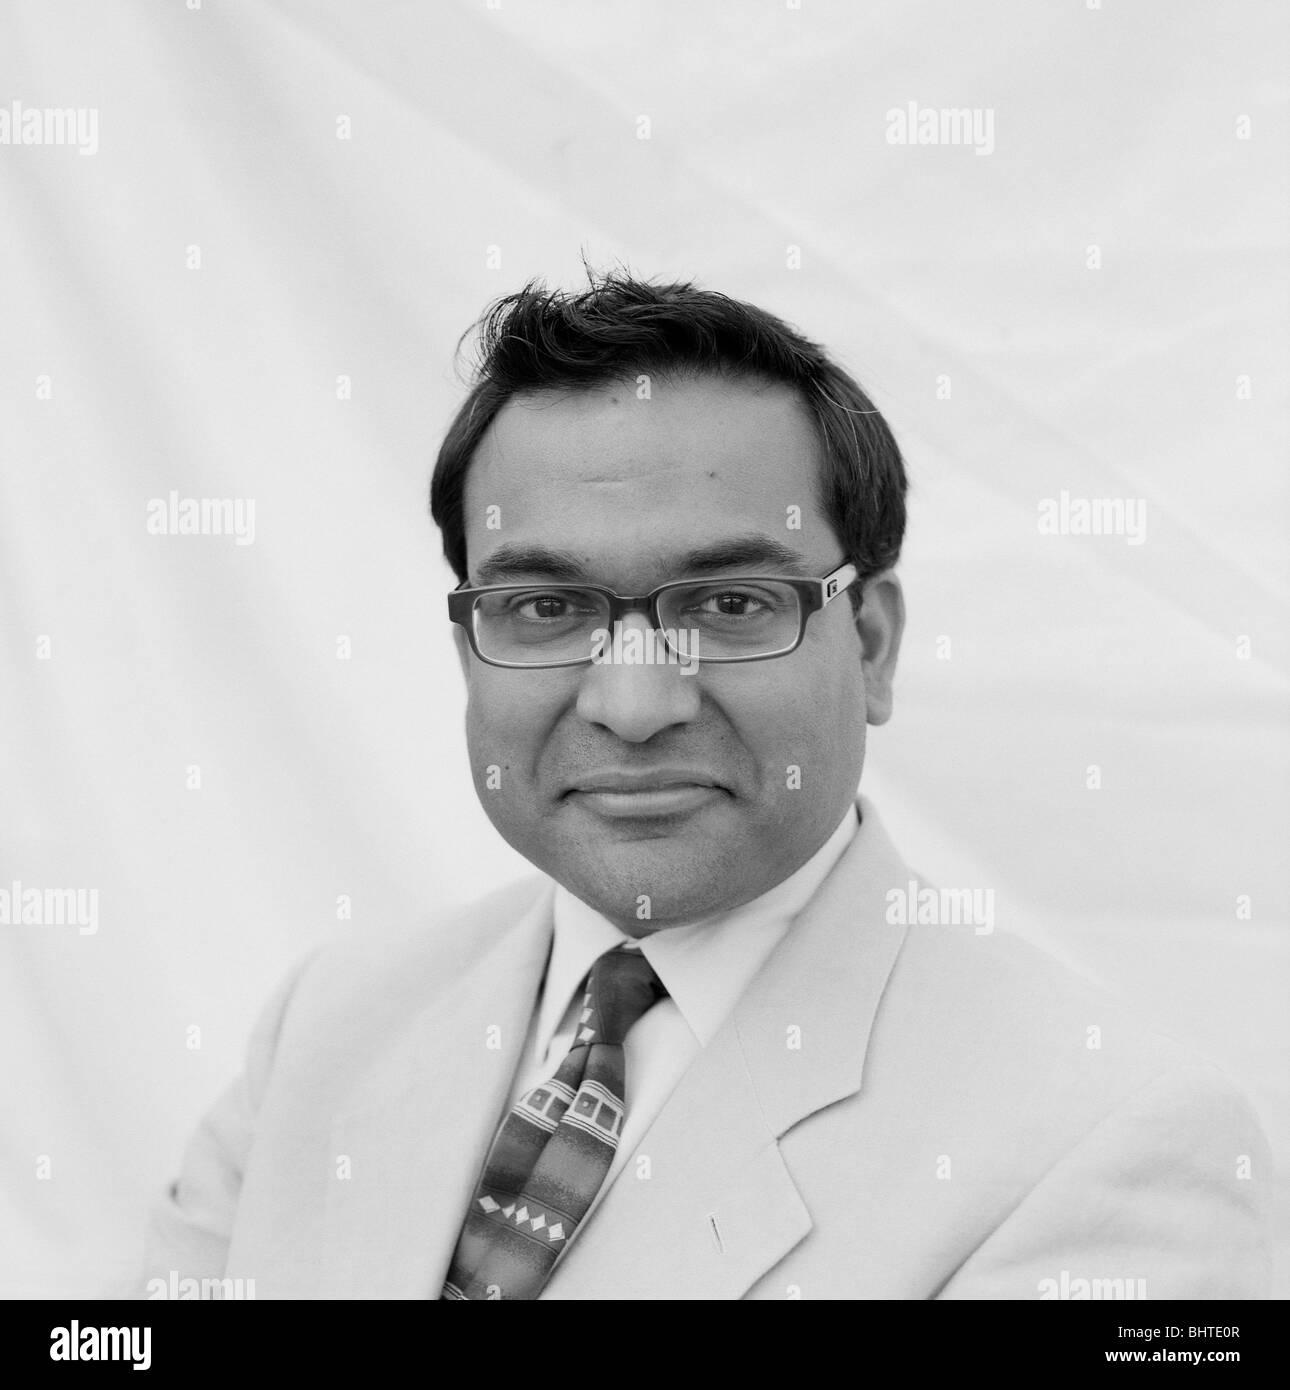 Psychiatrist Raj Persaud at the Guardian Hay Festival, Hay-on-Wye, Wales, UK - Stock Image